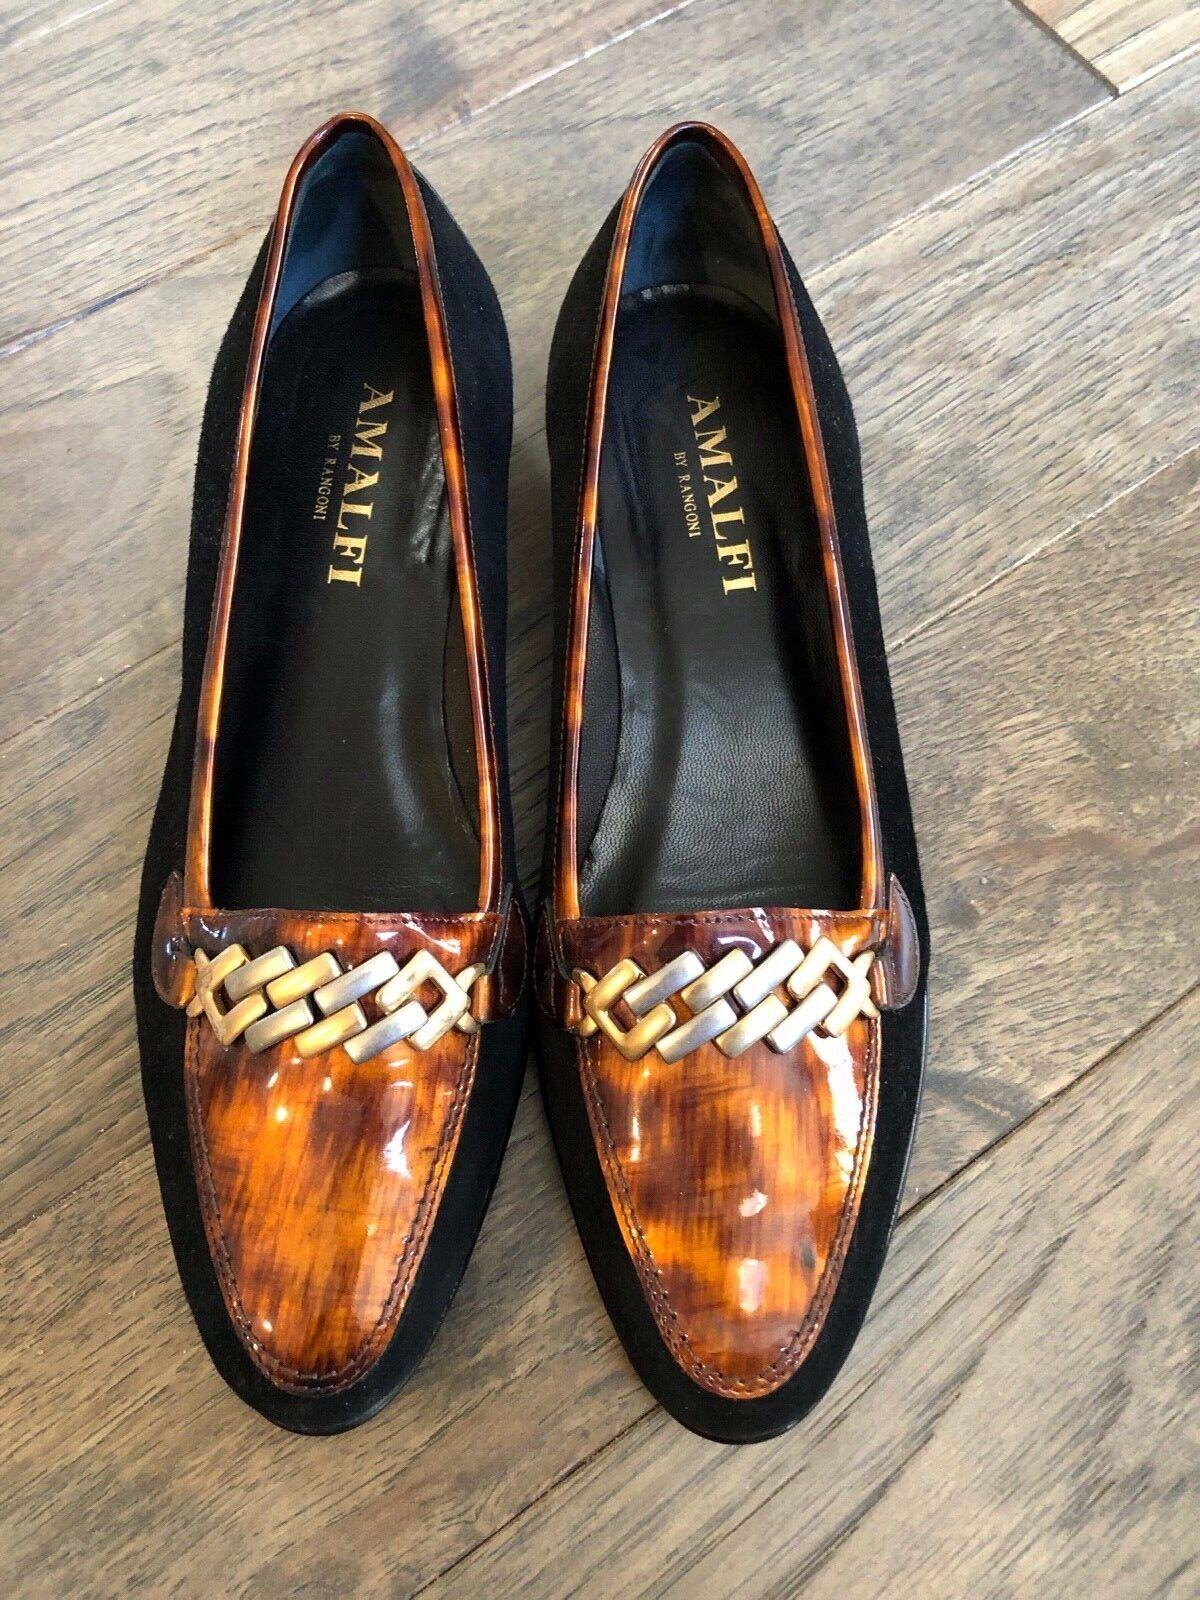 Amalfi By Rangoni oste negro ante Y Bronce Negro Charol Charol Charol Zapatos-Talla 8.5C-NEW  barato